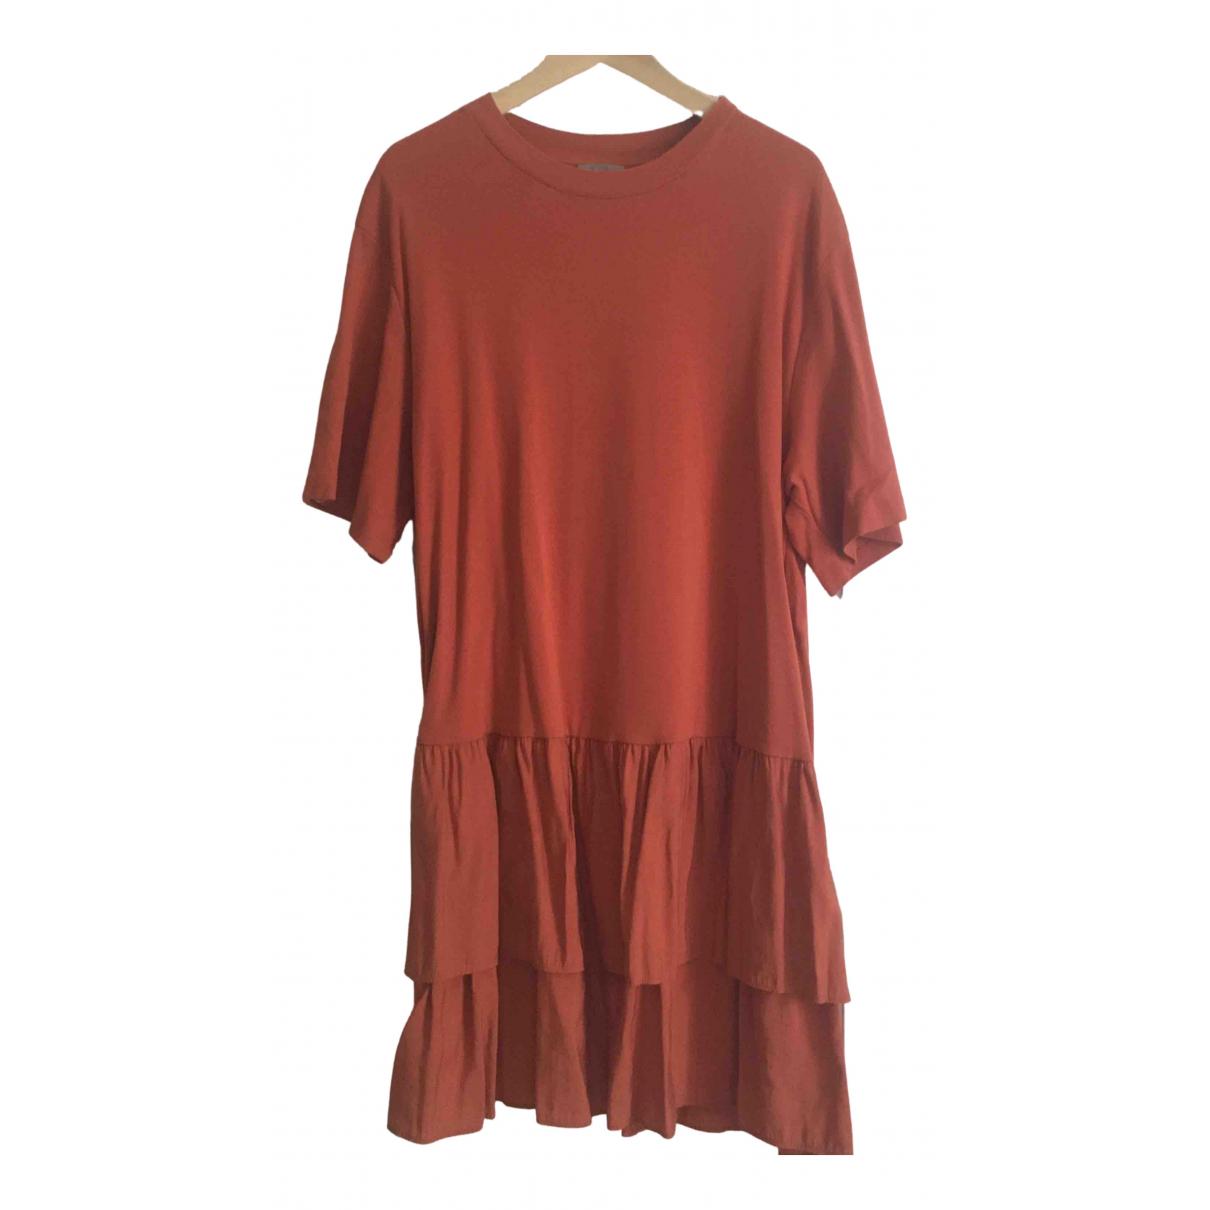 Cos \N Cotton dress for Women S International